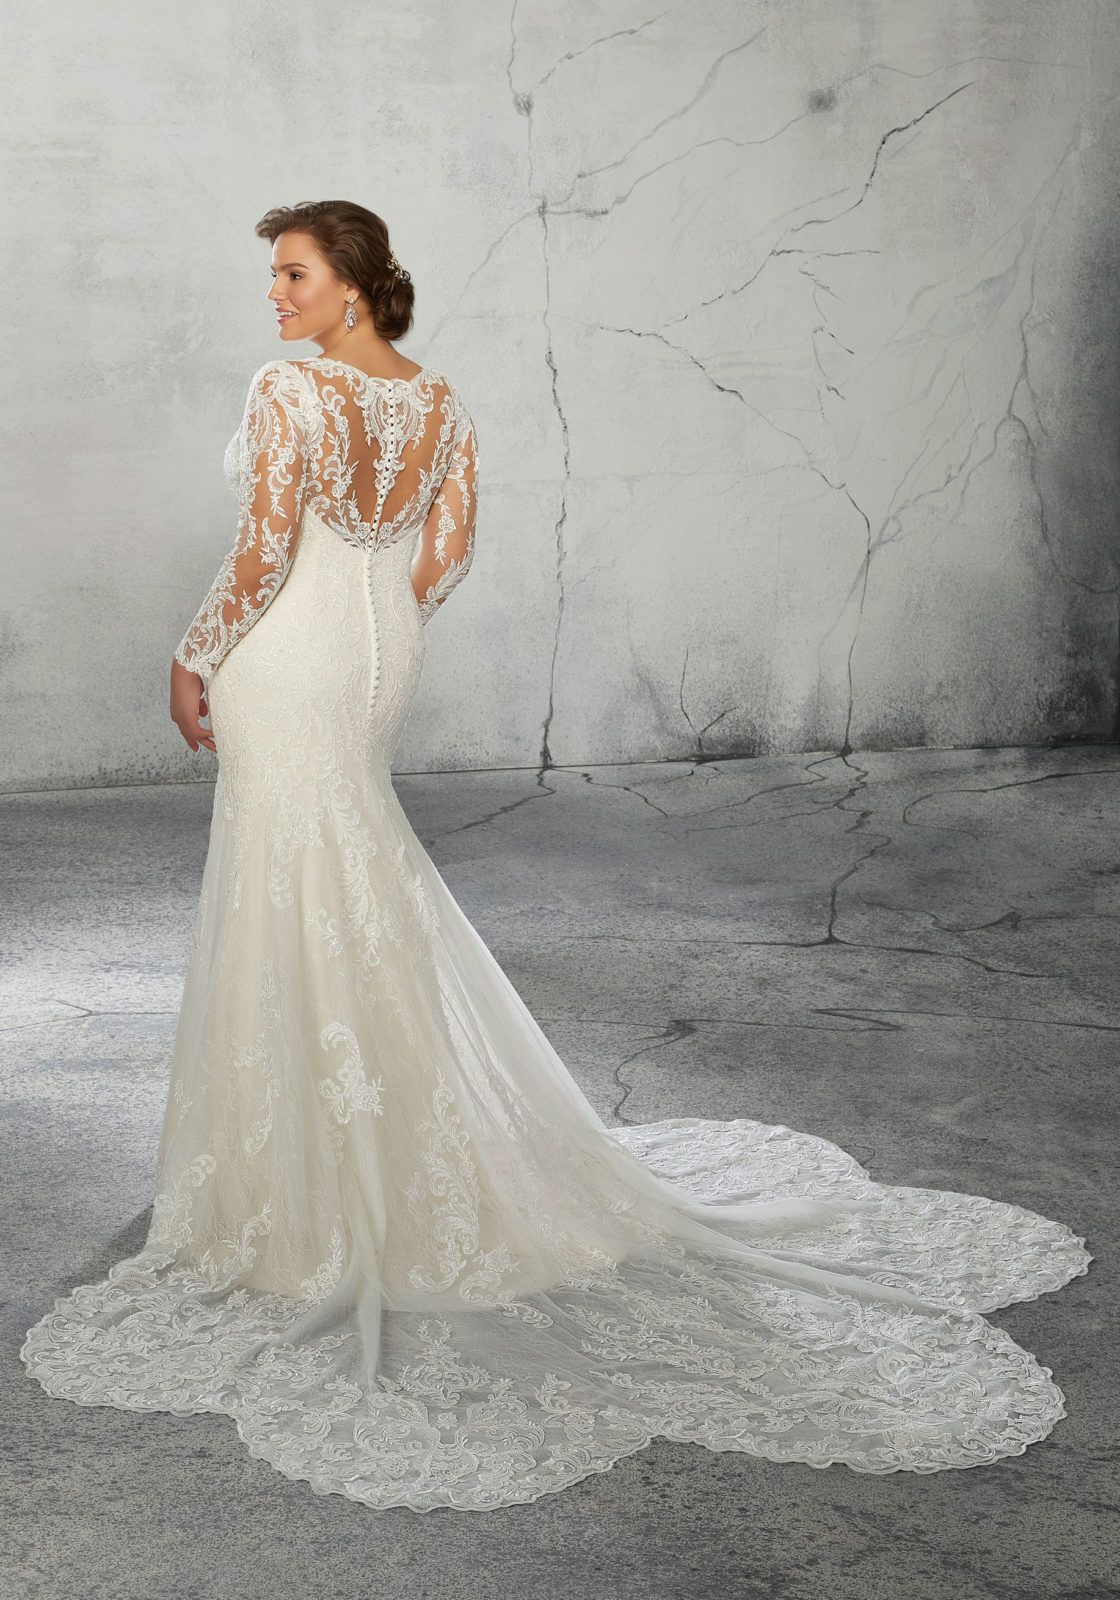 Ripley Plus Size Wedding Dress Morilee Plus Size Wedding Gowns Fit Flare Wedding Dress Bridal Wedding Dresses